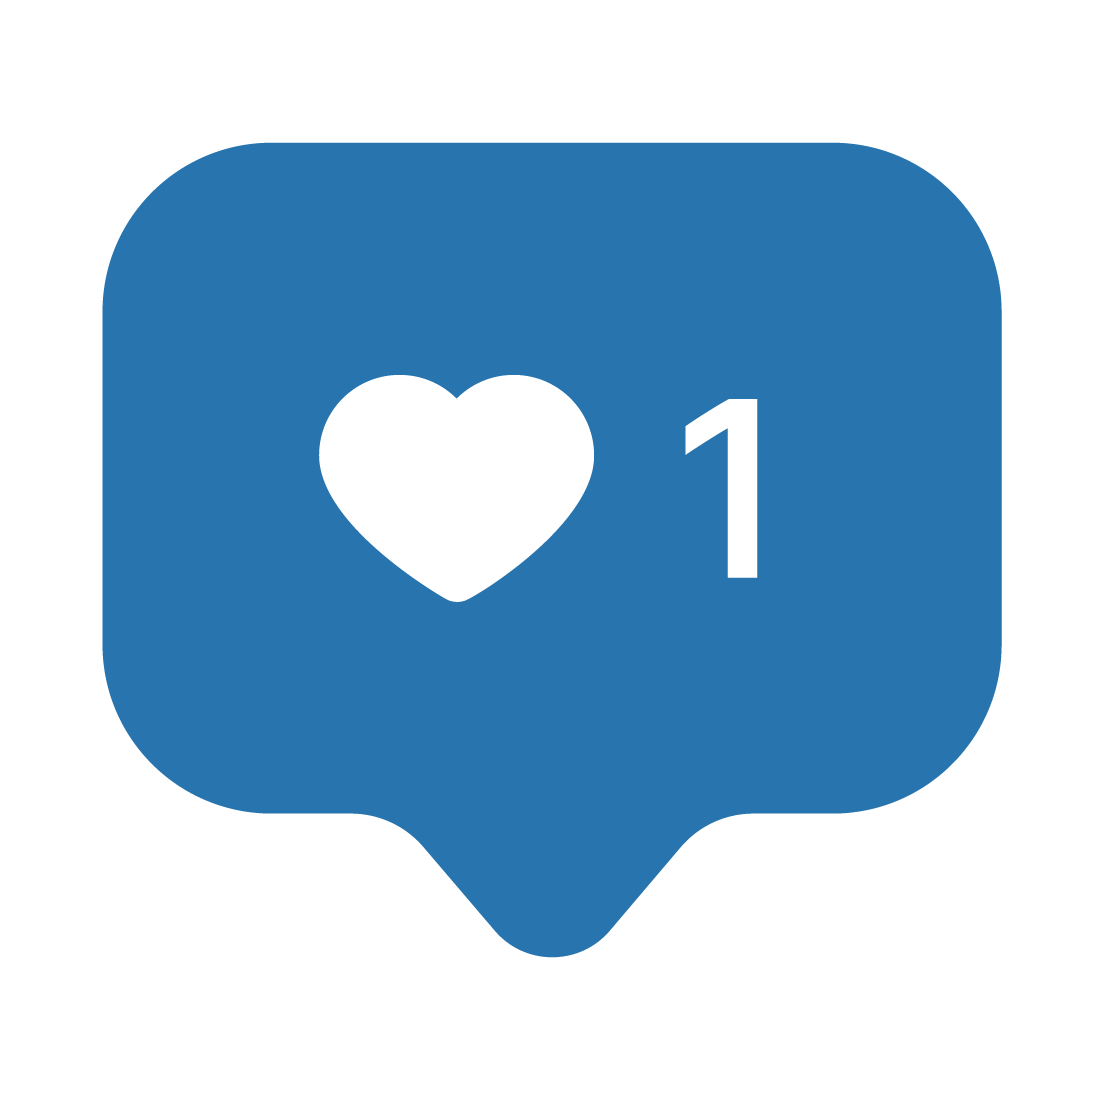 Social-Giphys_Static-Like-Heart-Atlas.png